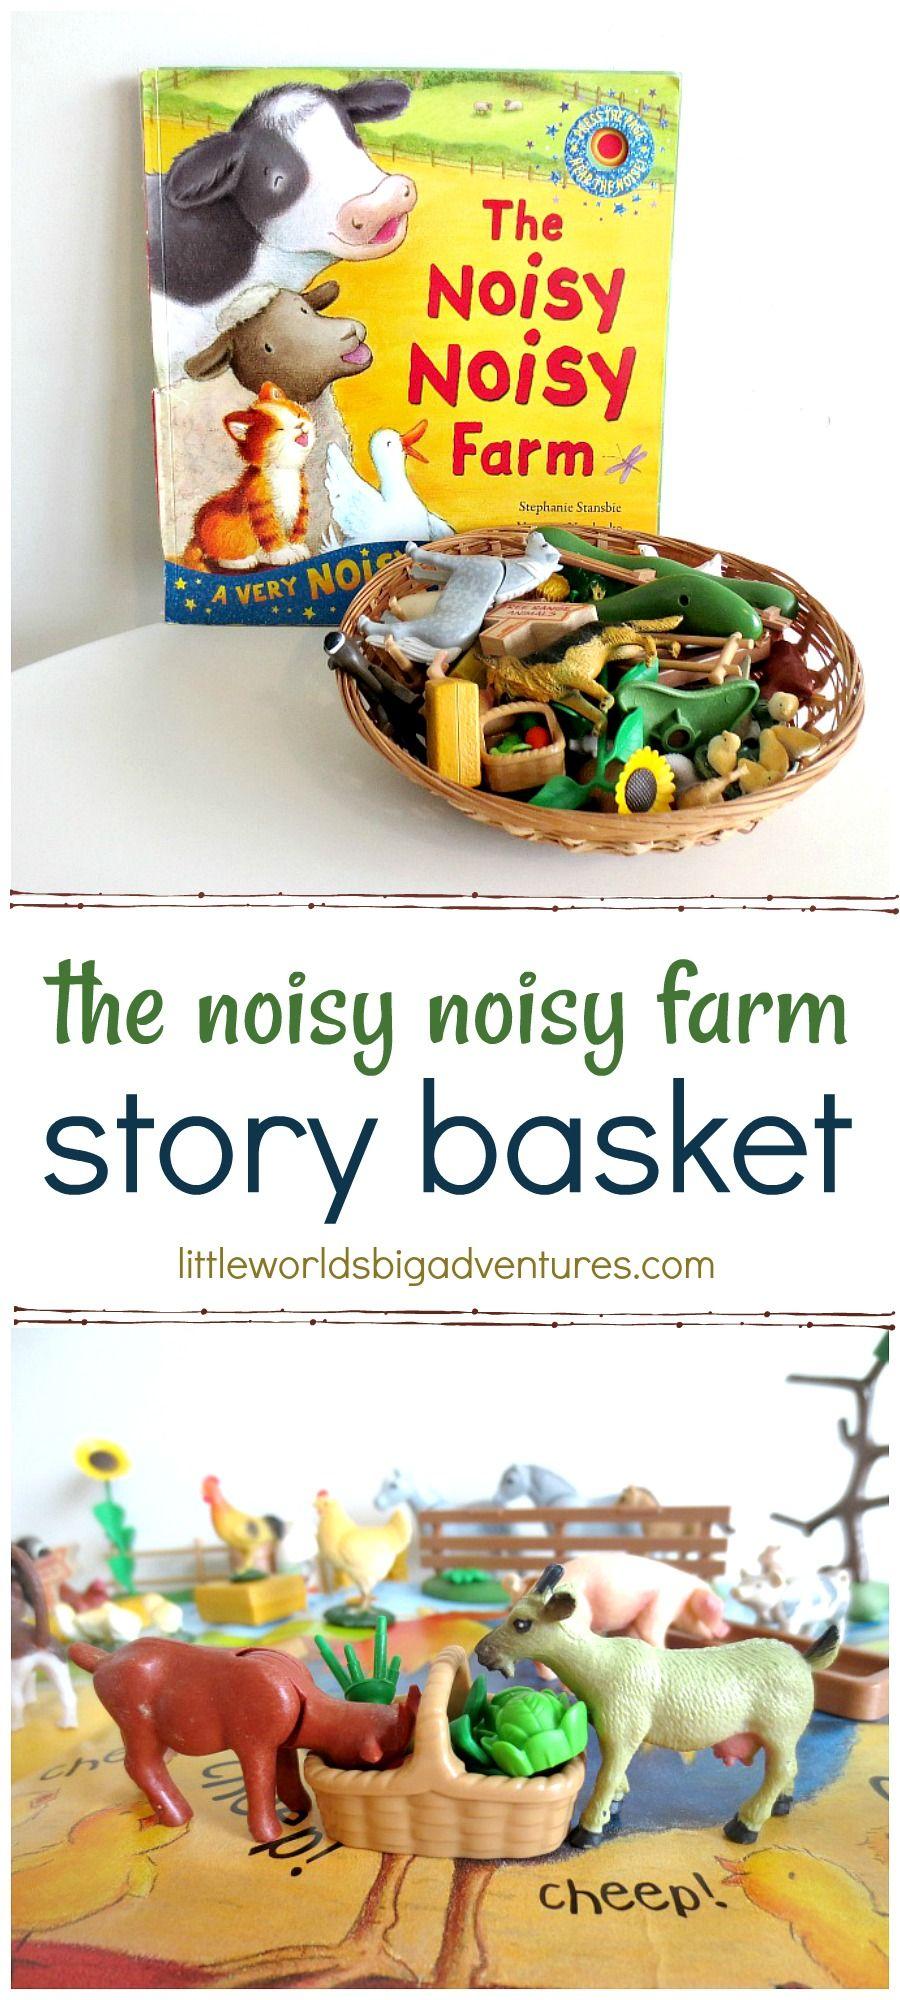 The Noisy Noisy Farm story basket for creative storytelling and play. | Little Worlds Big Adventures #farmlife #storybasket #smallworldplay #childrensbooks #storytelling #storytime #story #preschool #toddler #kidsactivities #play